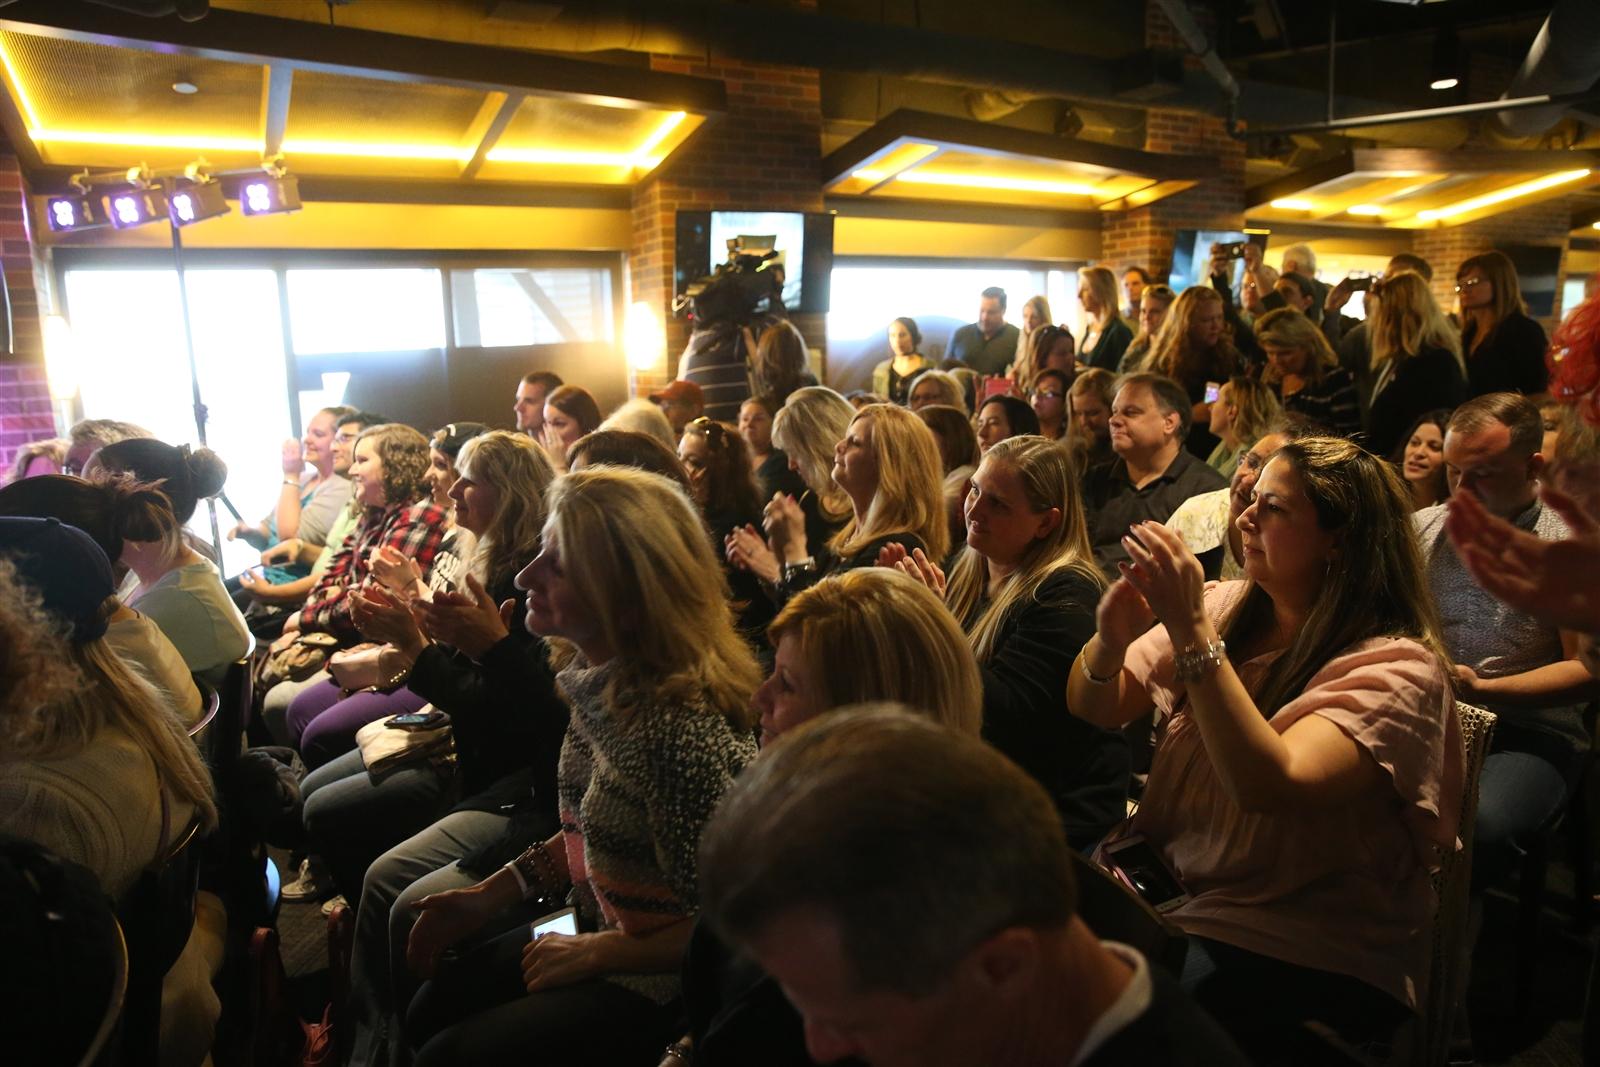 Fans get up close to the Goo Goo Dolls at the 716 Monday. (Sharon Cantillon/Buffalo News)